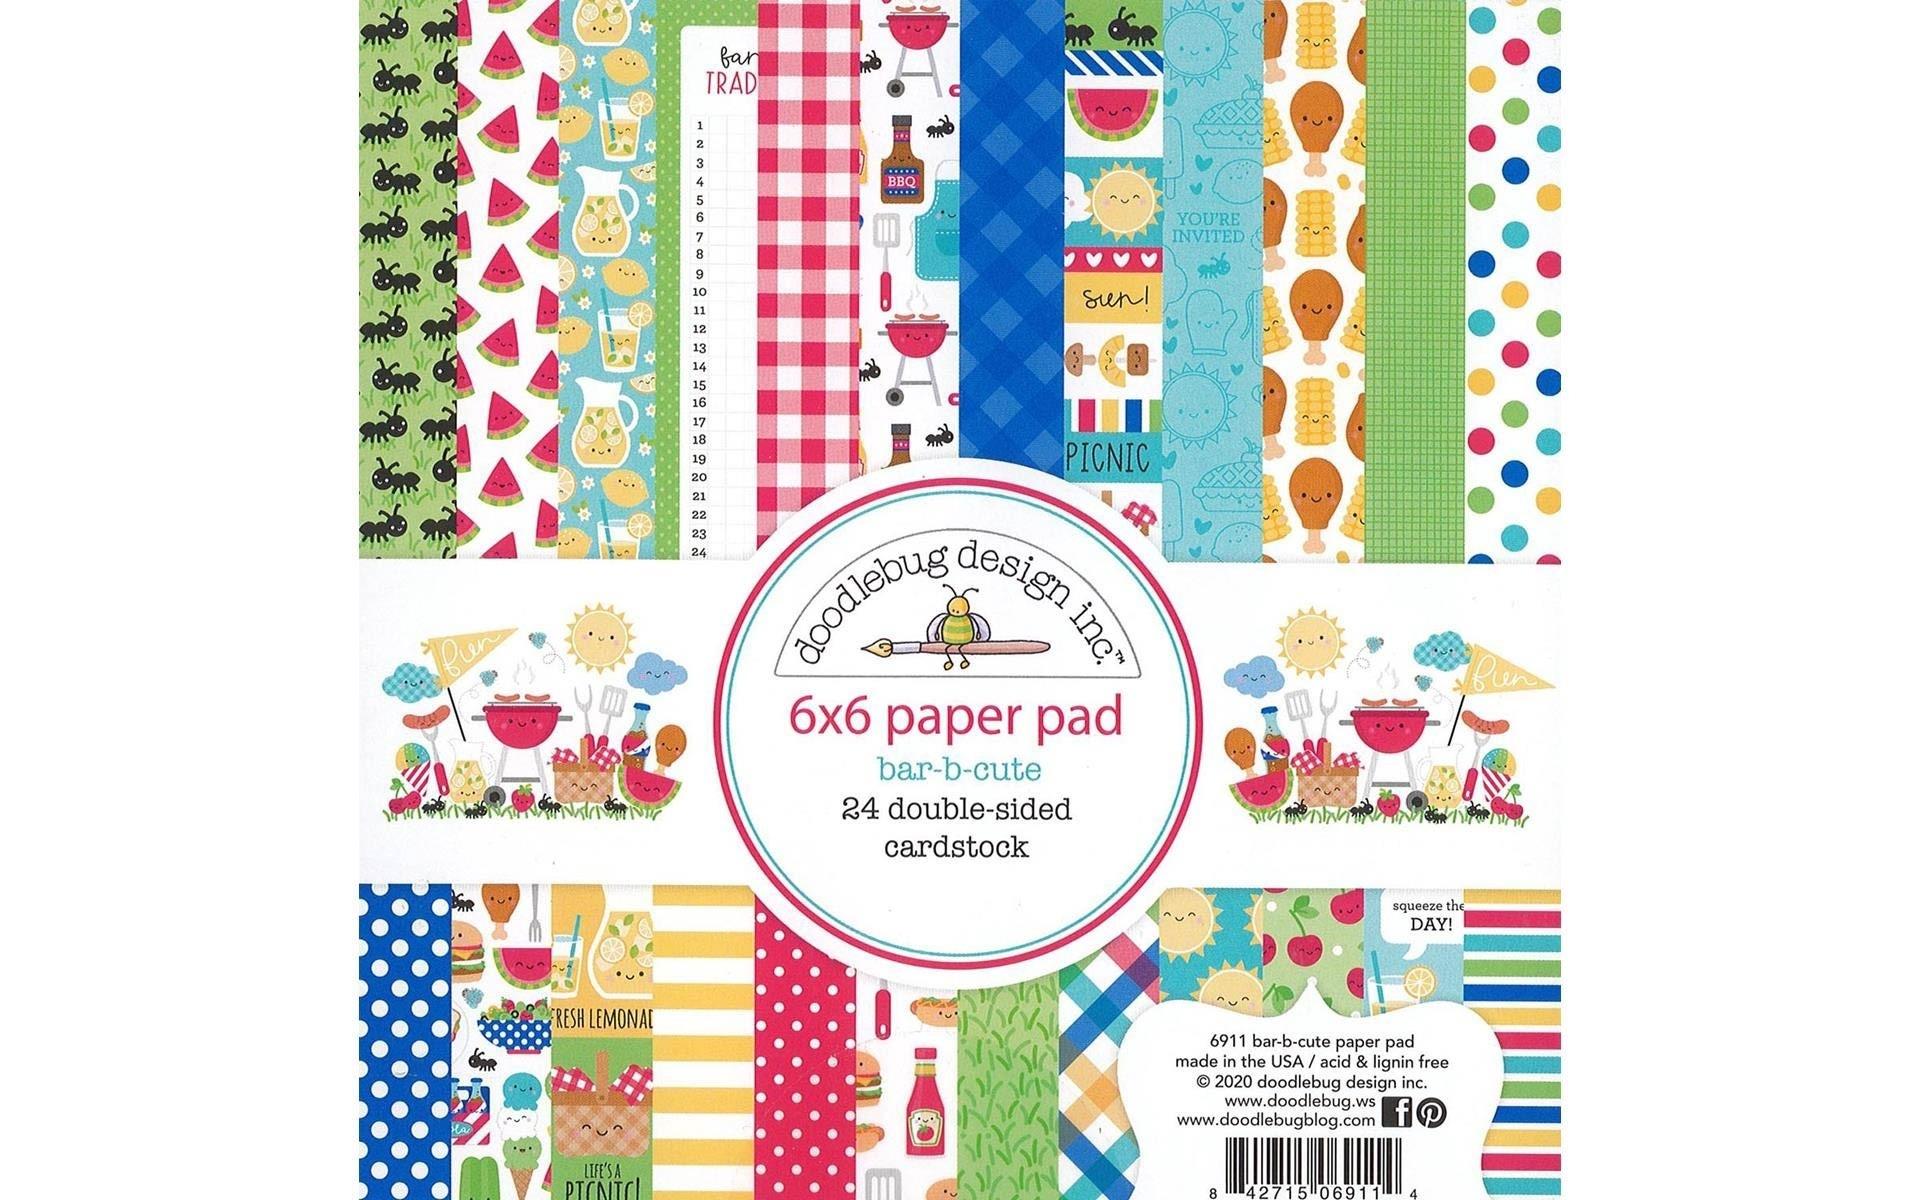 Doodlebug Design Bar B Cute Paper Pad